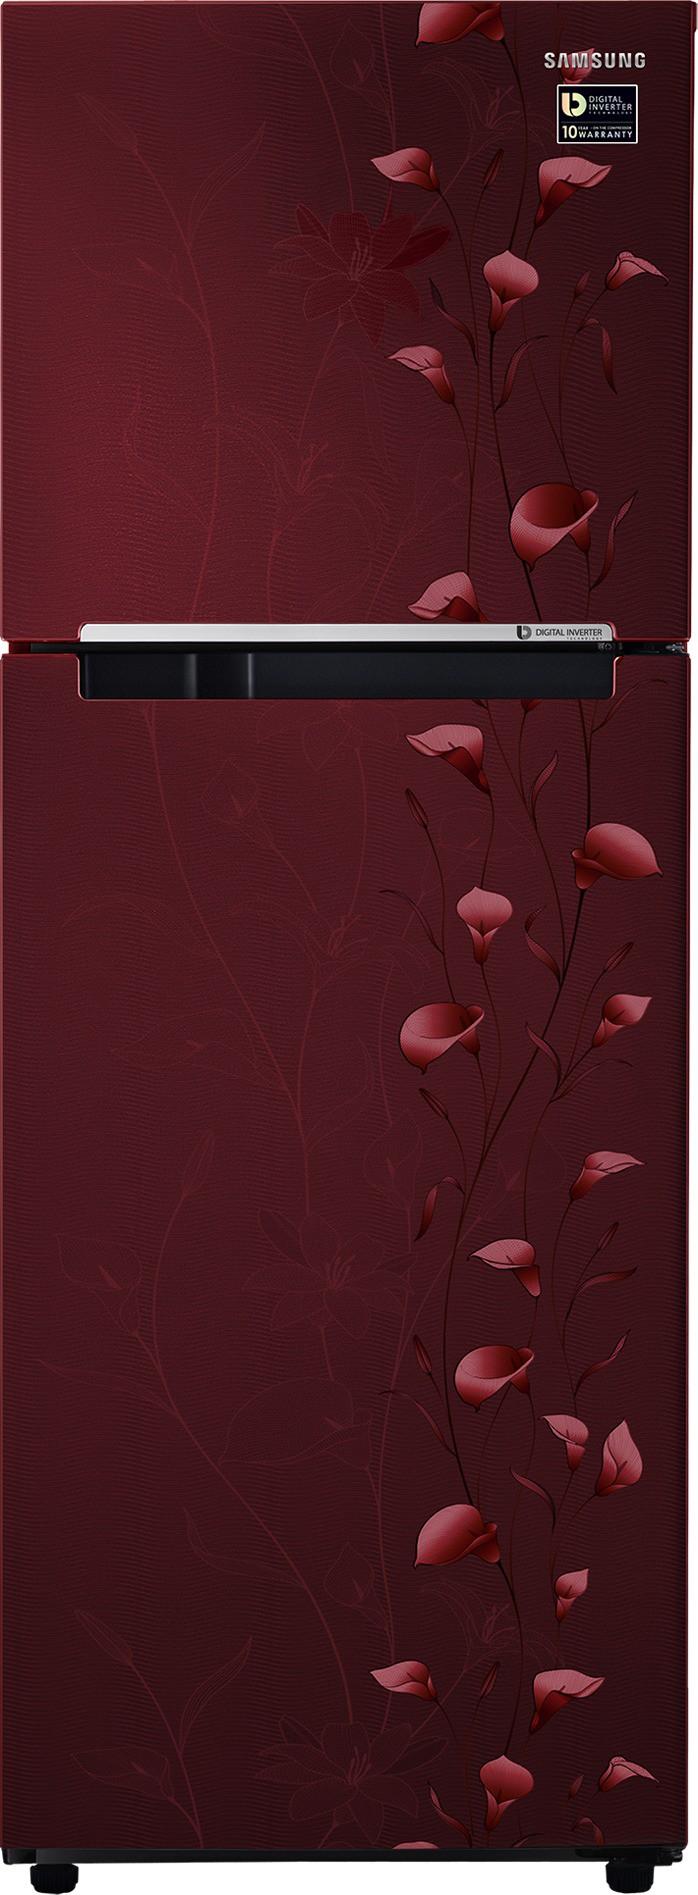 SAMSUNG 253 L Frost Free Double Door Refrigerator(RT28M3022RZ/HL, Tender Lily Red, 2017) (Samsung) Tamil Nadu Buy Online